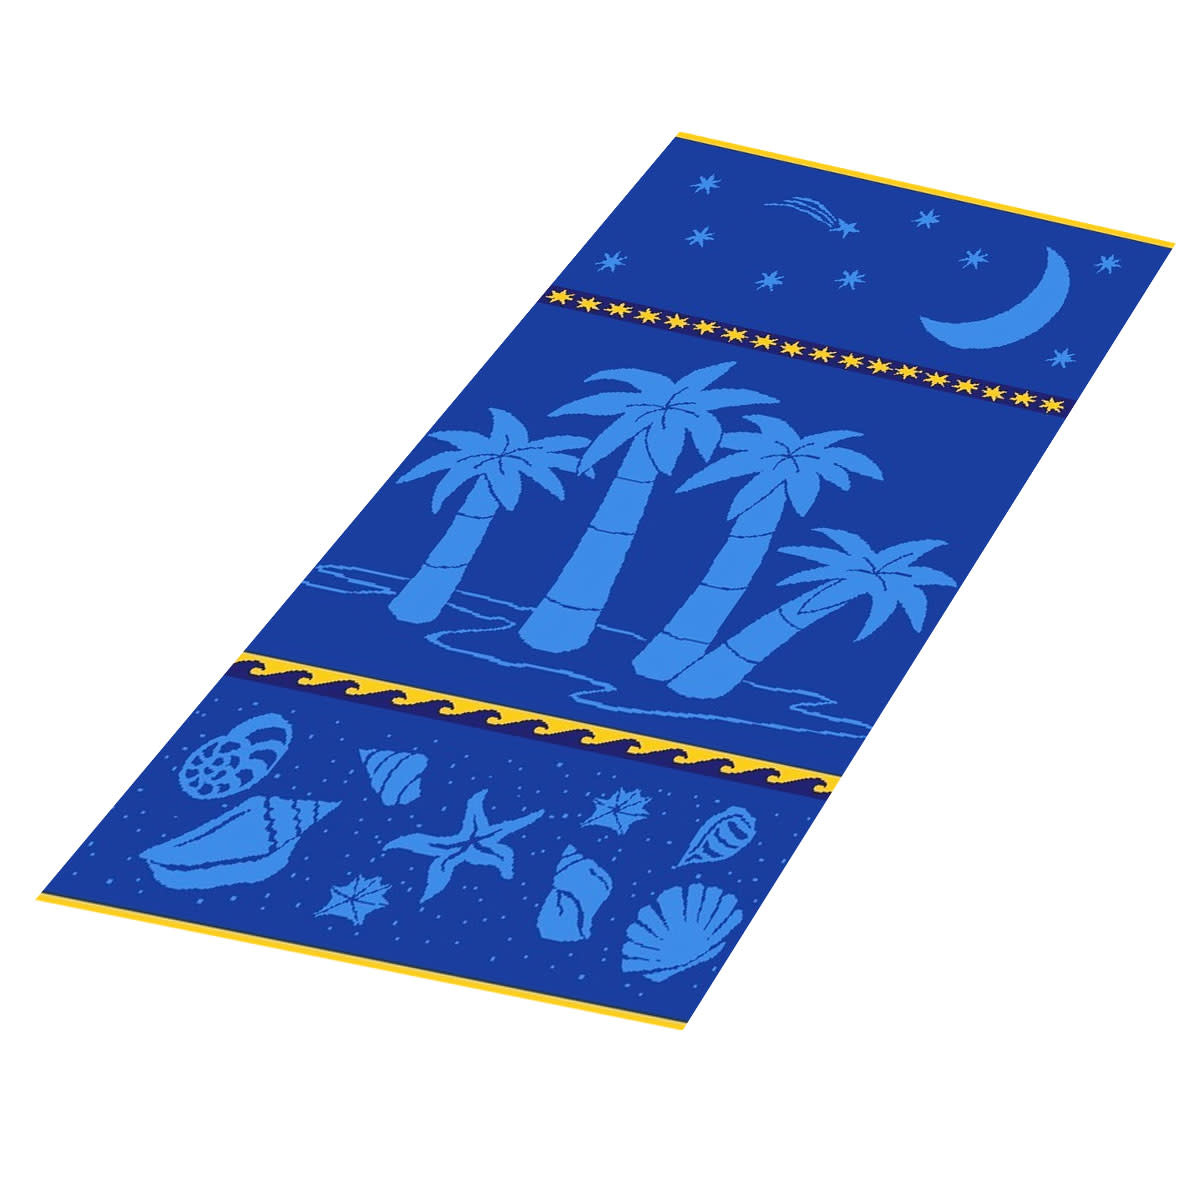 Textiles Aloha - Sheared Jacquard Beach Towel